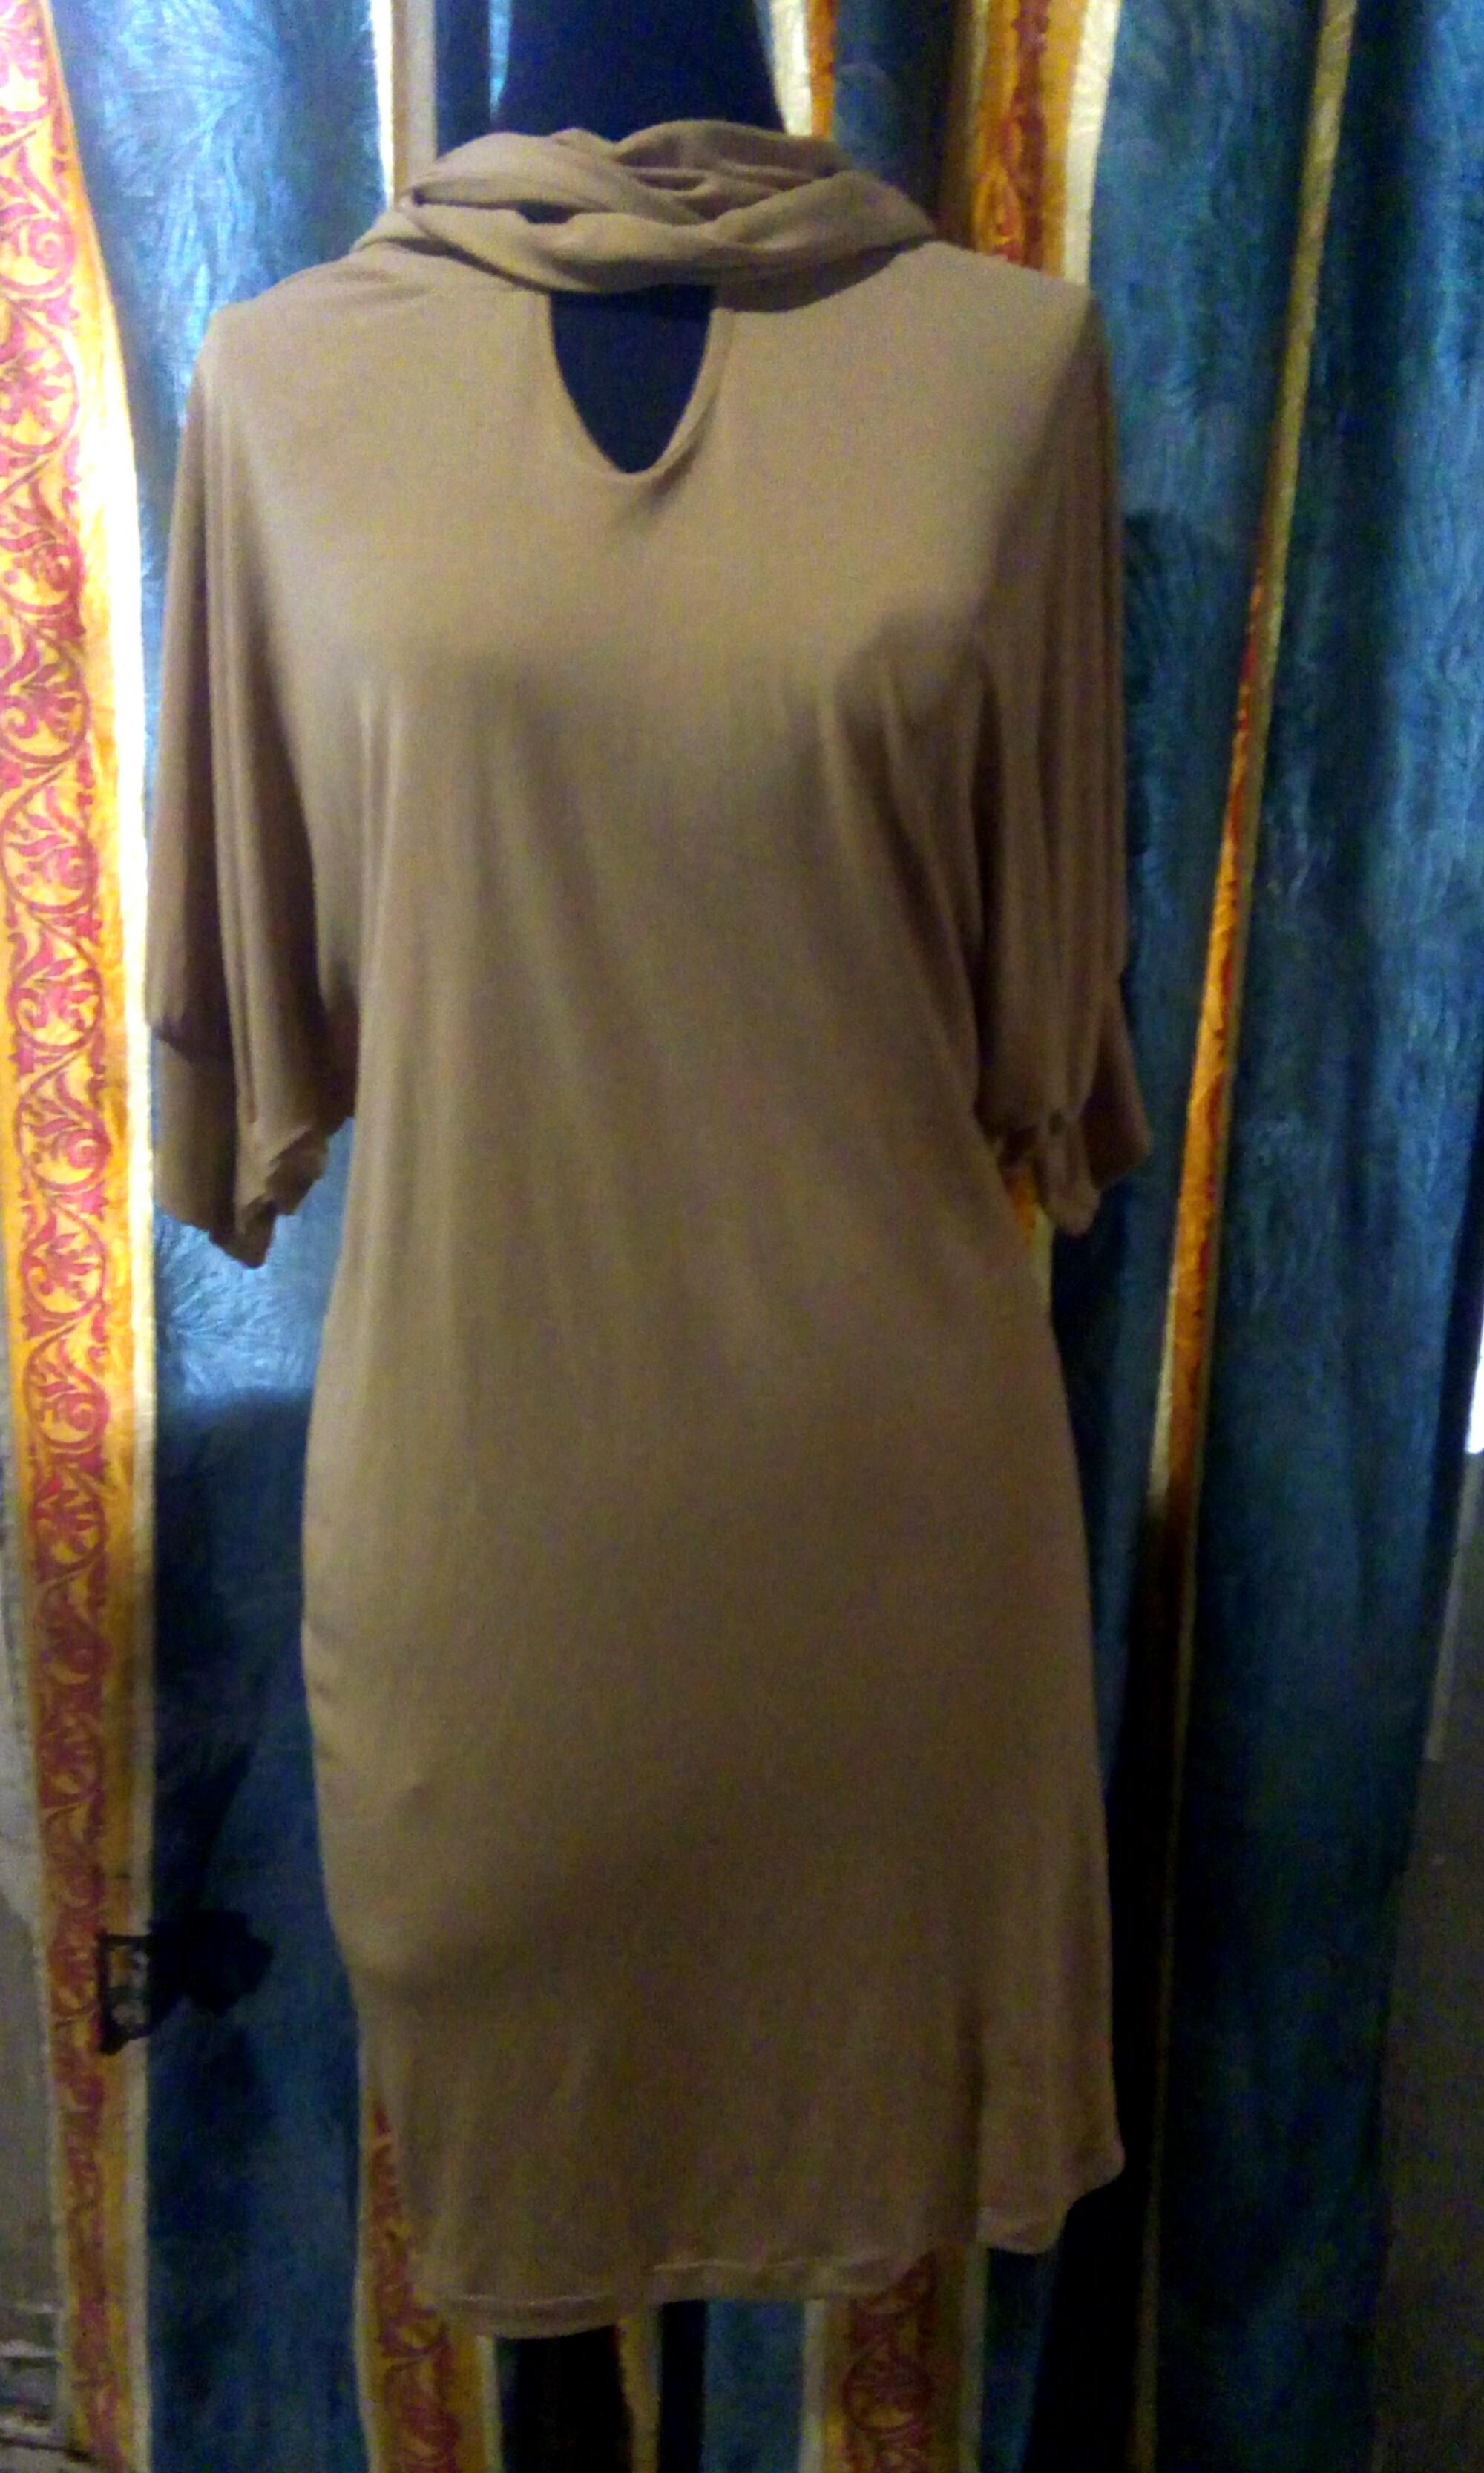 1f8091b73 PLUS SIZE preloved branded clothes debenhams warehouse dorothy ...